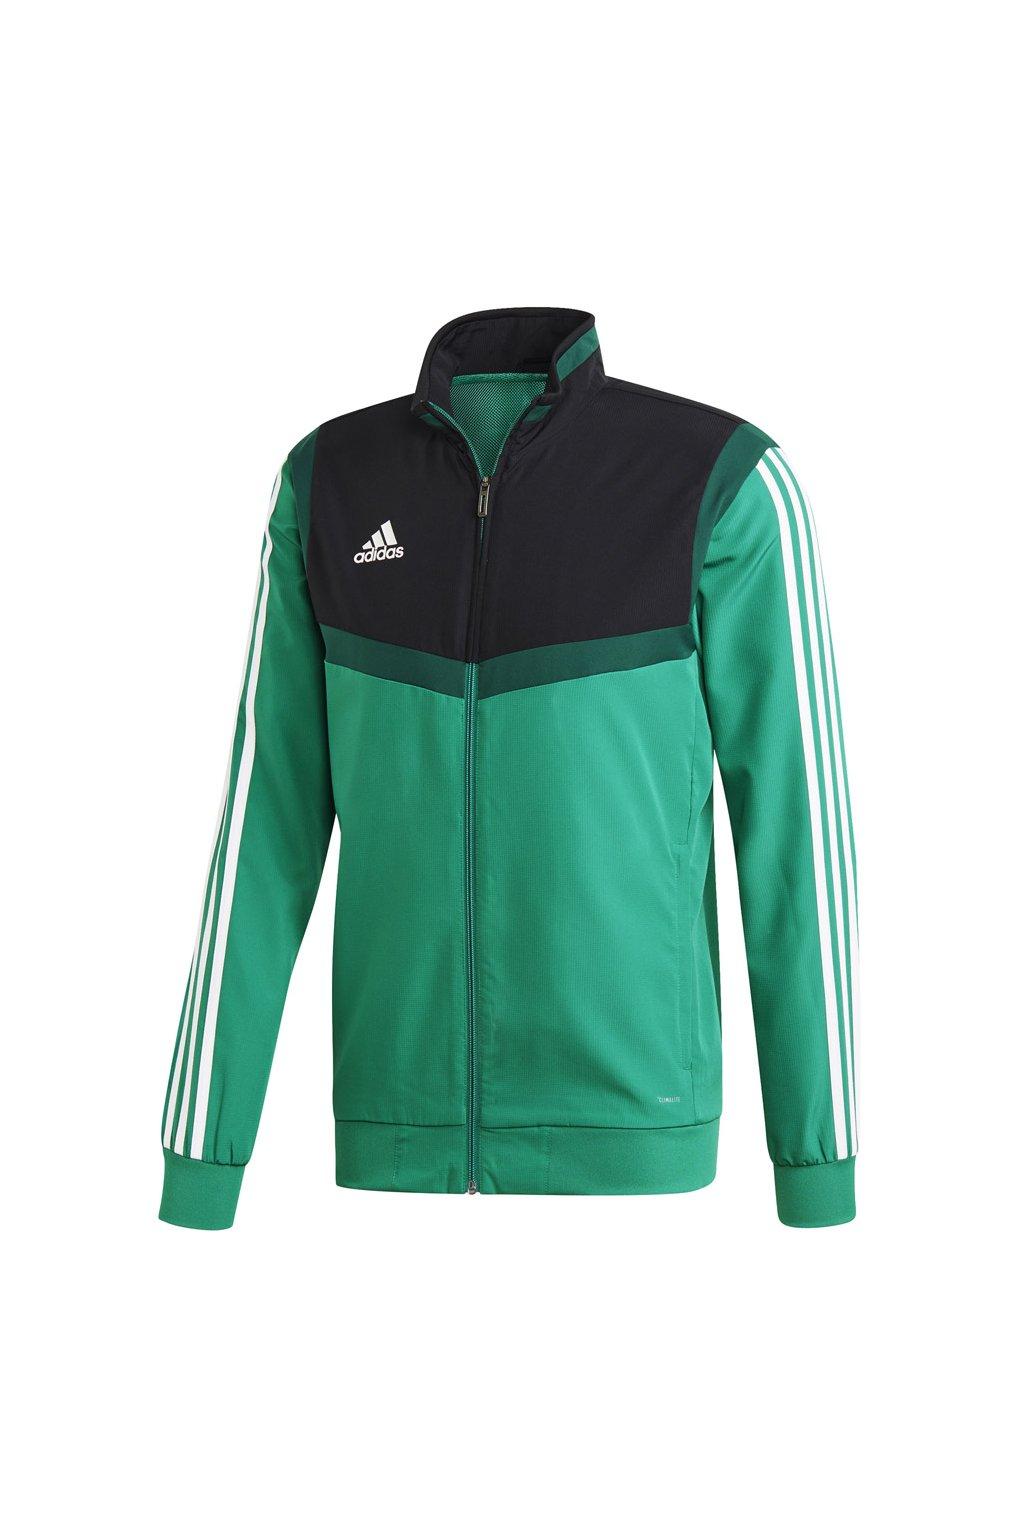 Pánska bunda Adidas Tiro 19 Presentation Jacket green DW4788